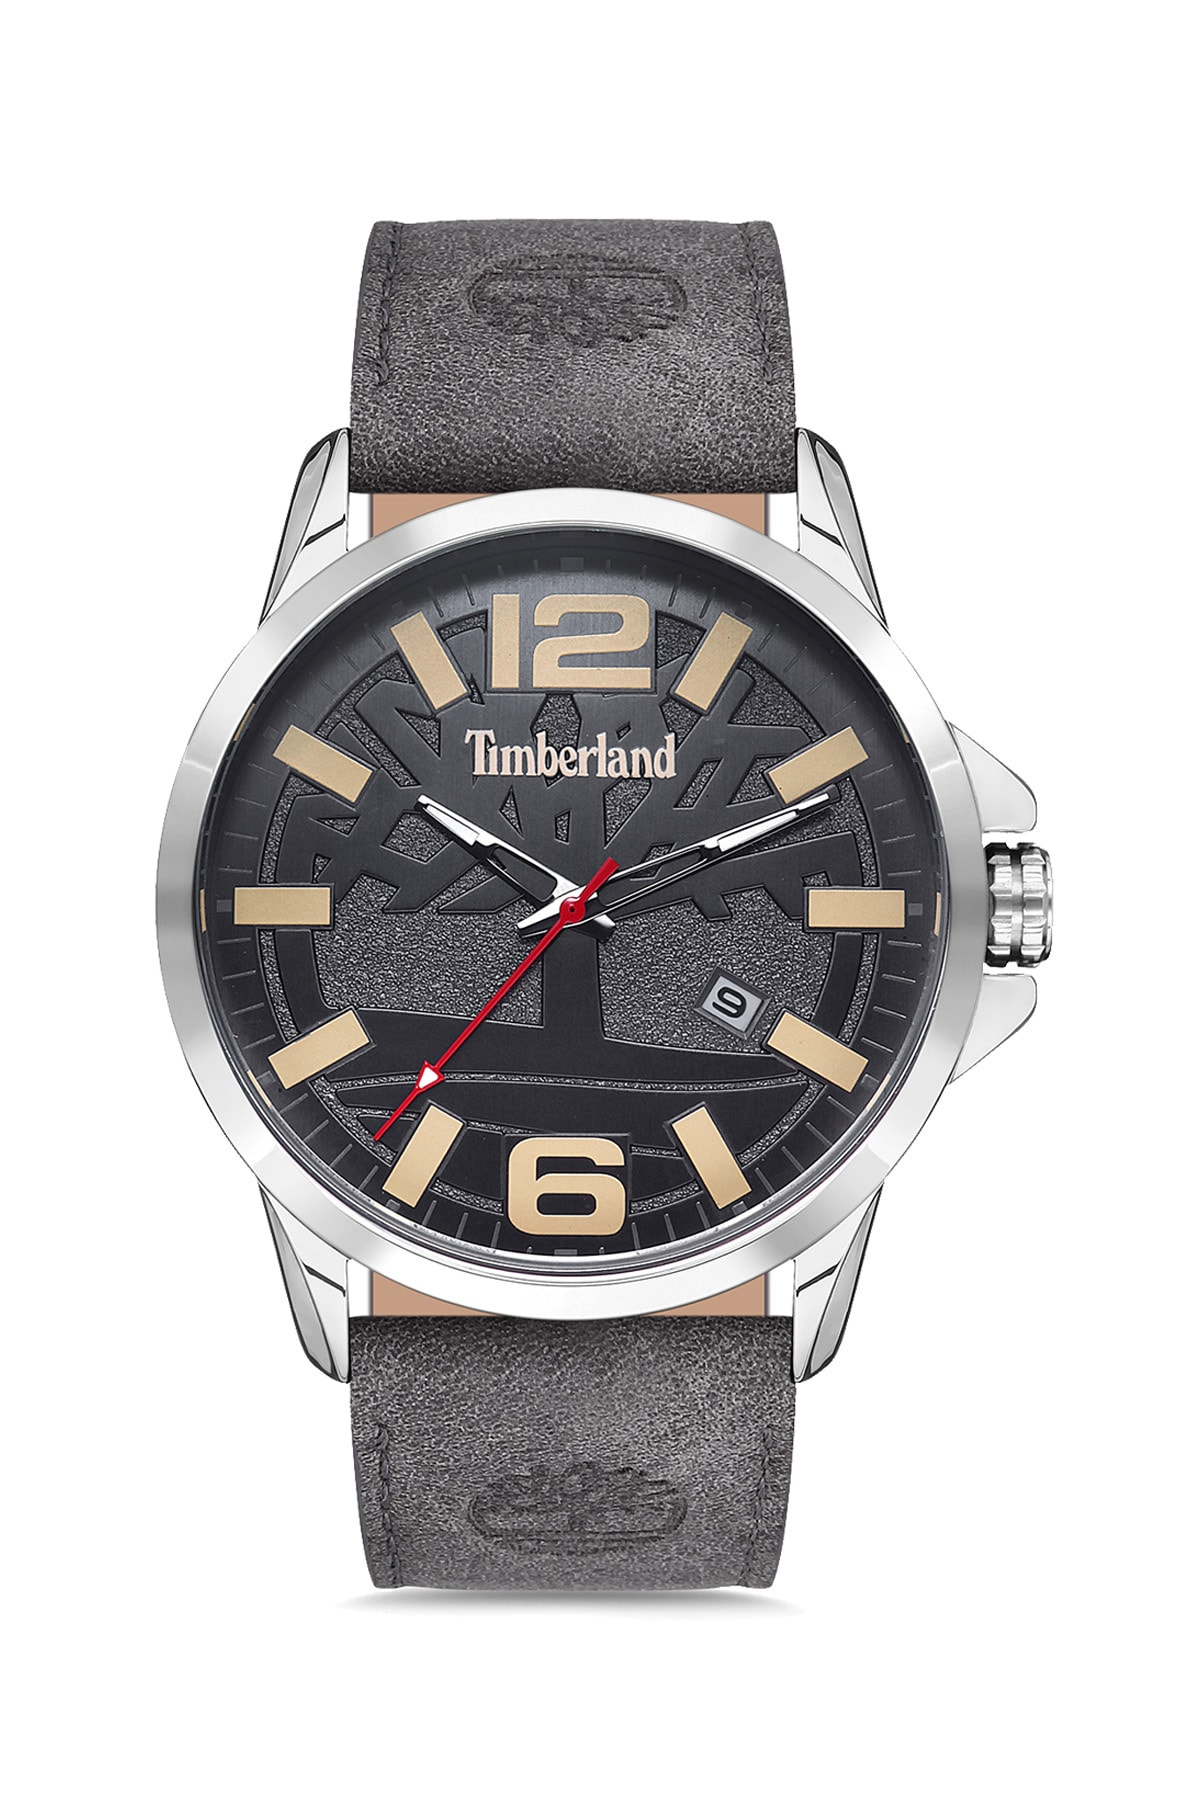 TIMBERLAND Fashion Business Men Watch Luxury Brand  Wrist Watch  Quartz Watches Relogio Masculino  TBL.15905JYS Series